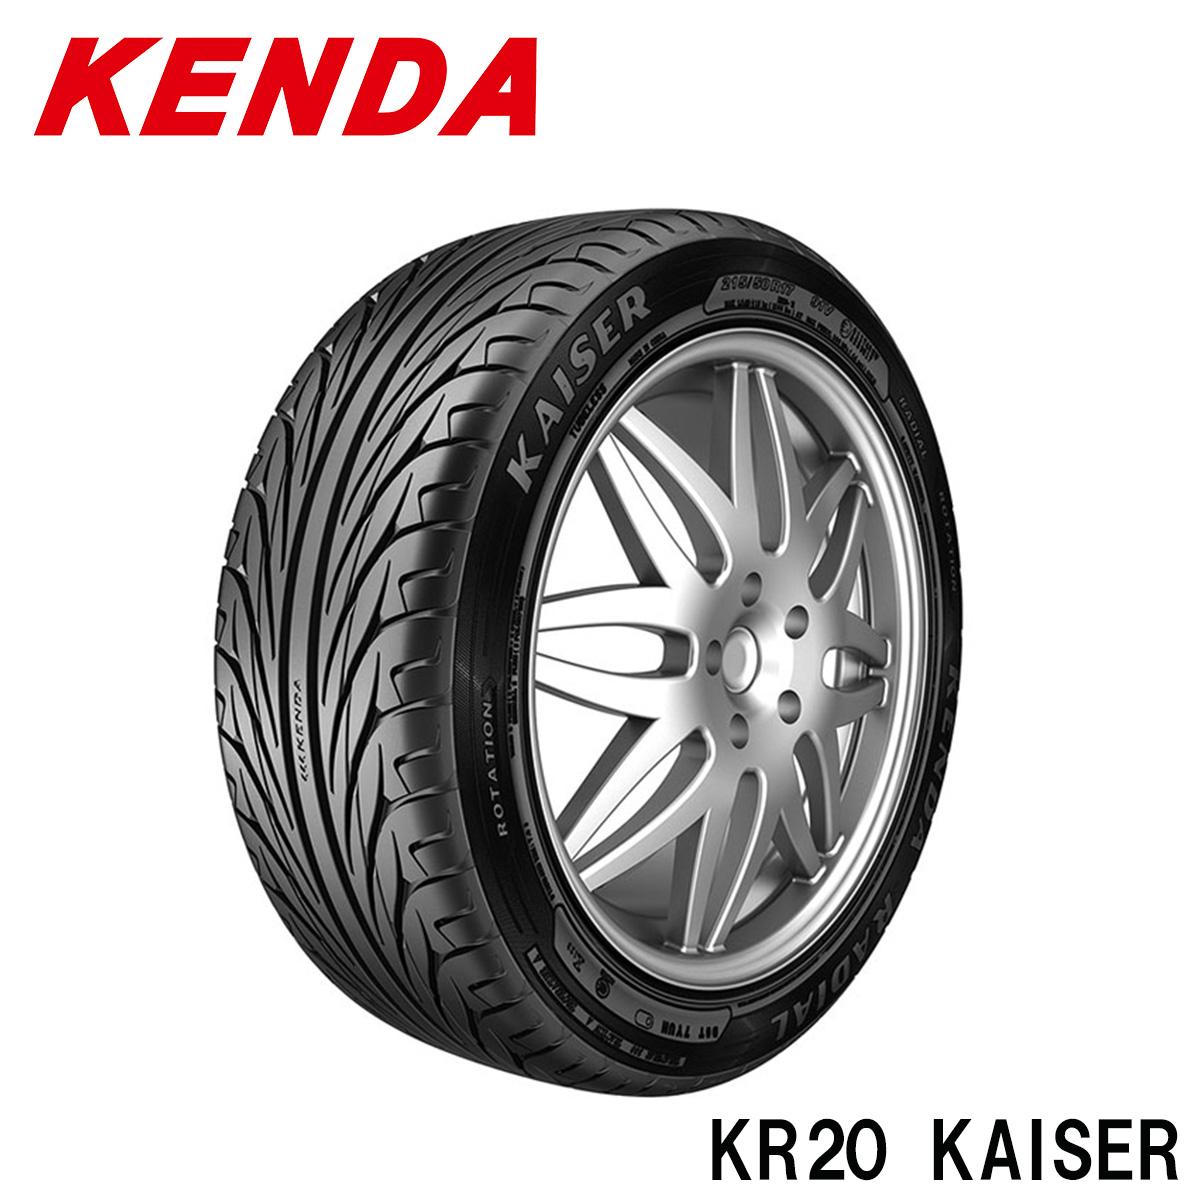 KENDA ケンダ サマータイヤ 2本 16インチ KR20 205/55R16 2本 カイザー 16インチ KAISER KR20, S1/5 エスゴブンノイチ:834dbf37 --- officewill.xsrv.jp